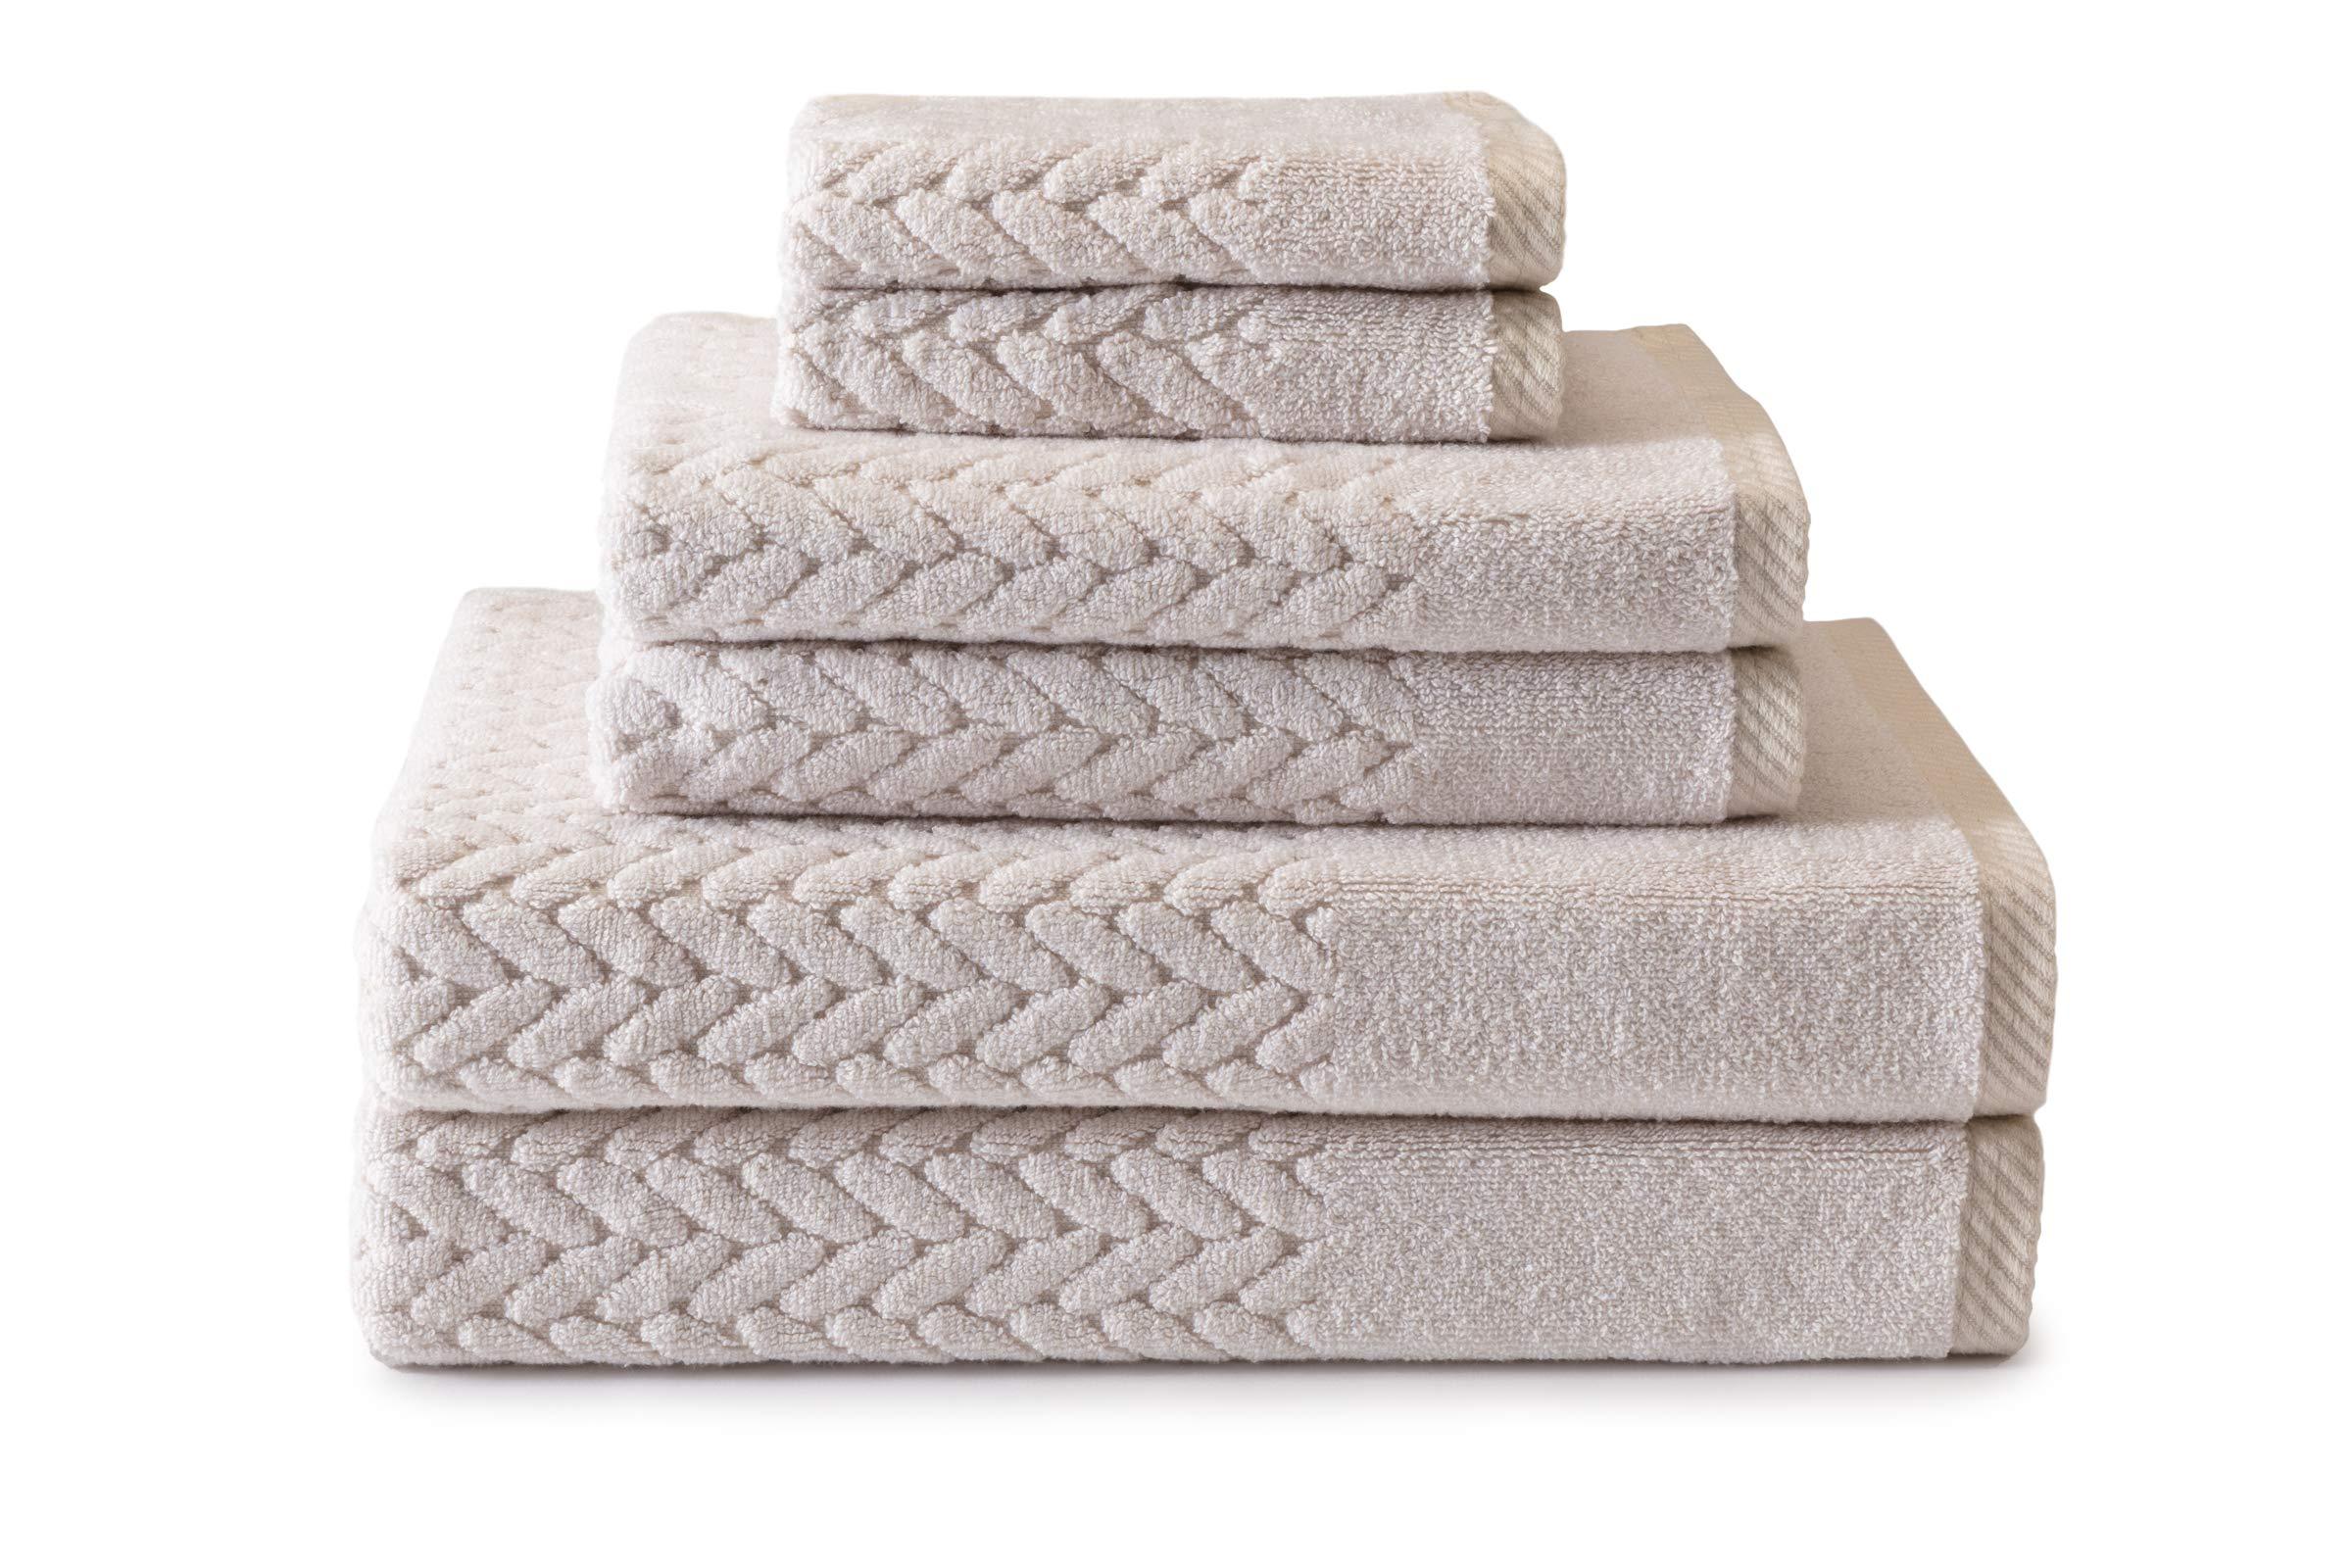 Texere 100% Organic Cotton 6-Piece Towel Set - Luxury Bath Towel (Chestnut, 6-Piece Set, Birch) Best Housewarming Gift TX-HC263-002-BRCH-R-6